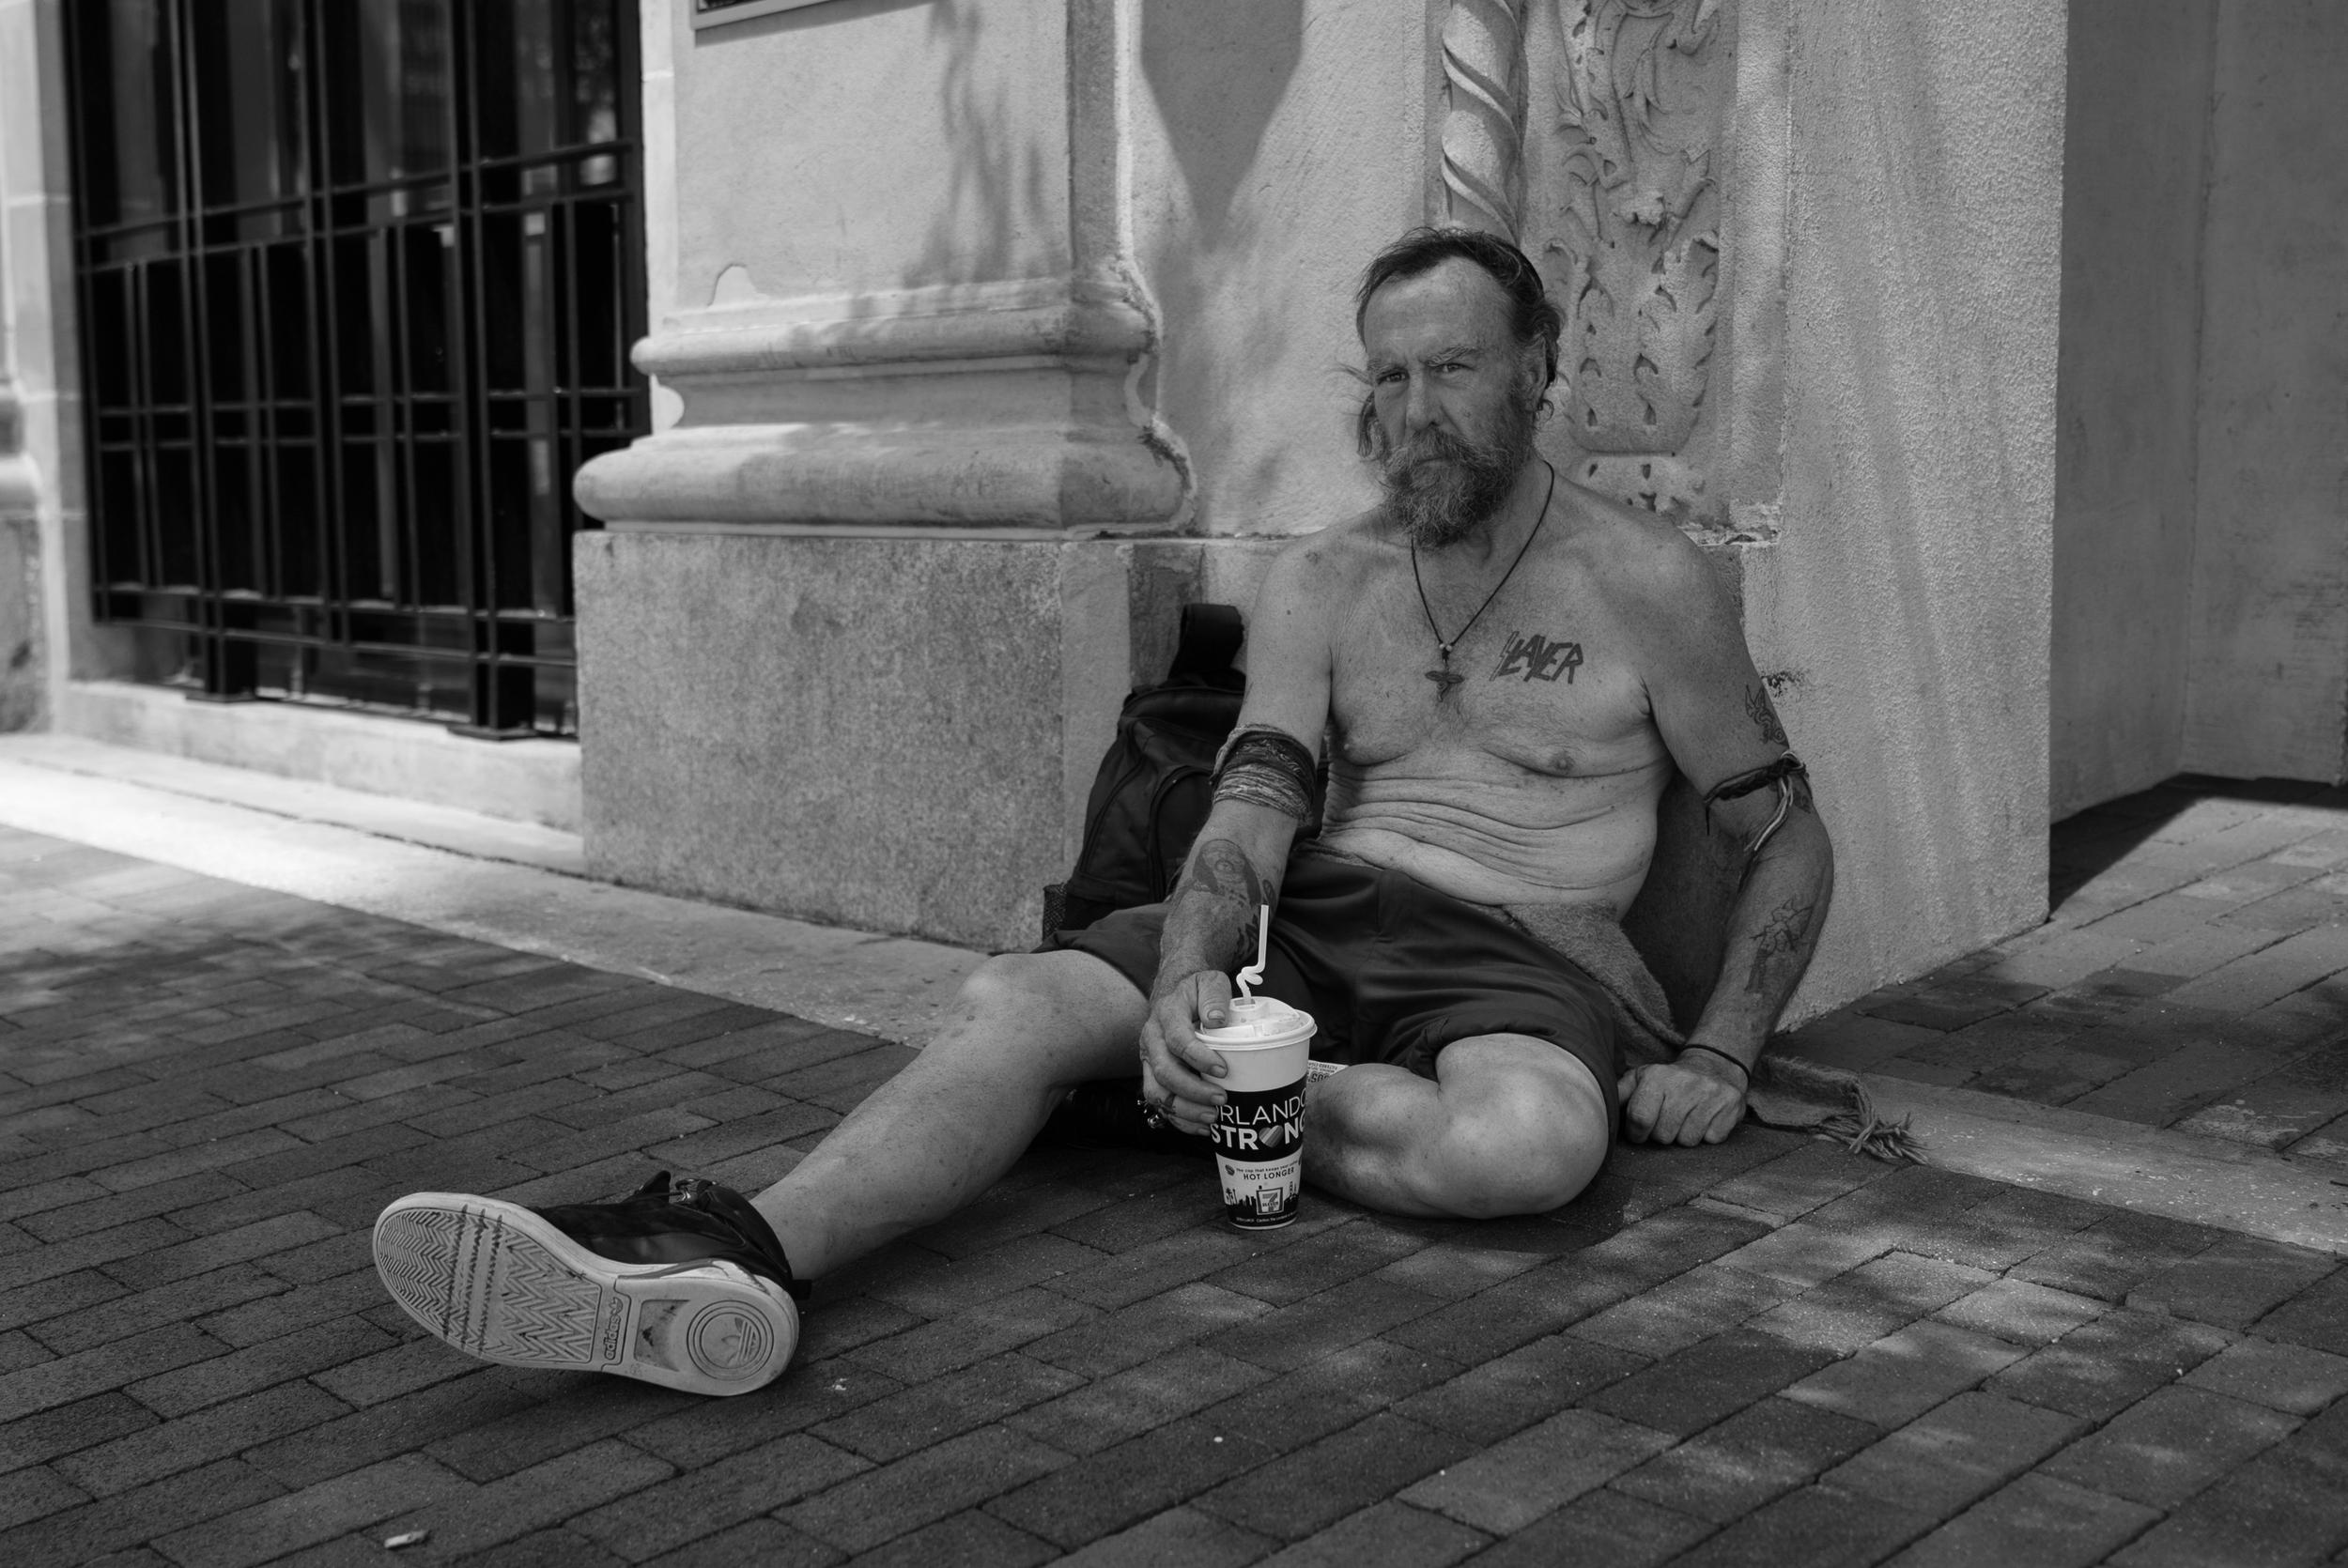 Man Sitting 1 (1 of 1).jpg